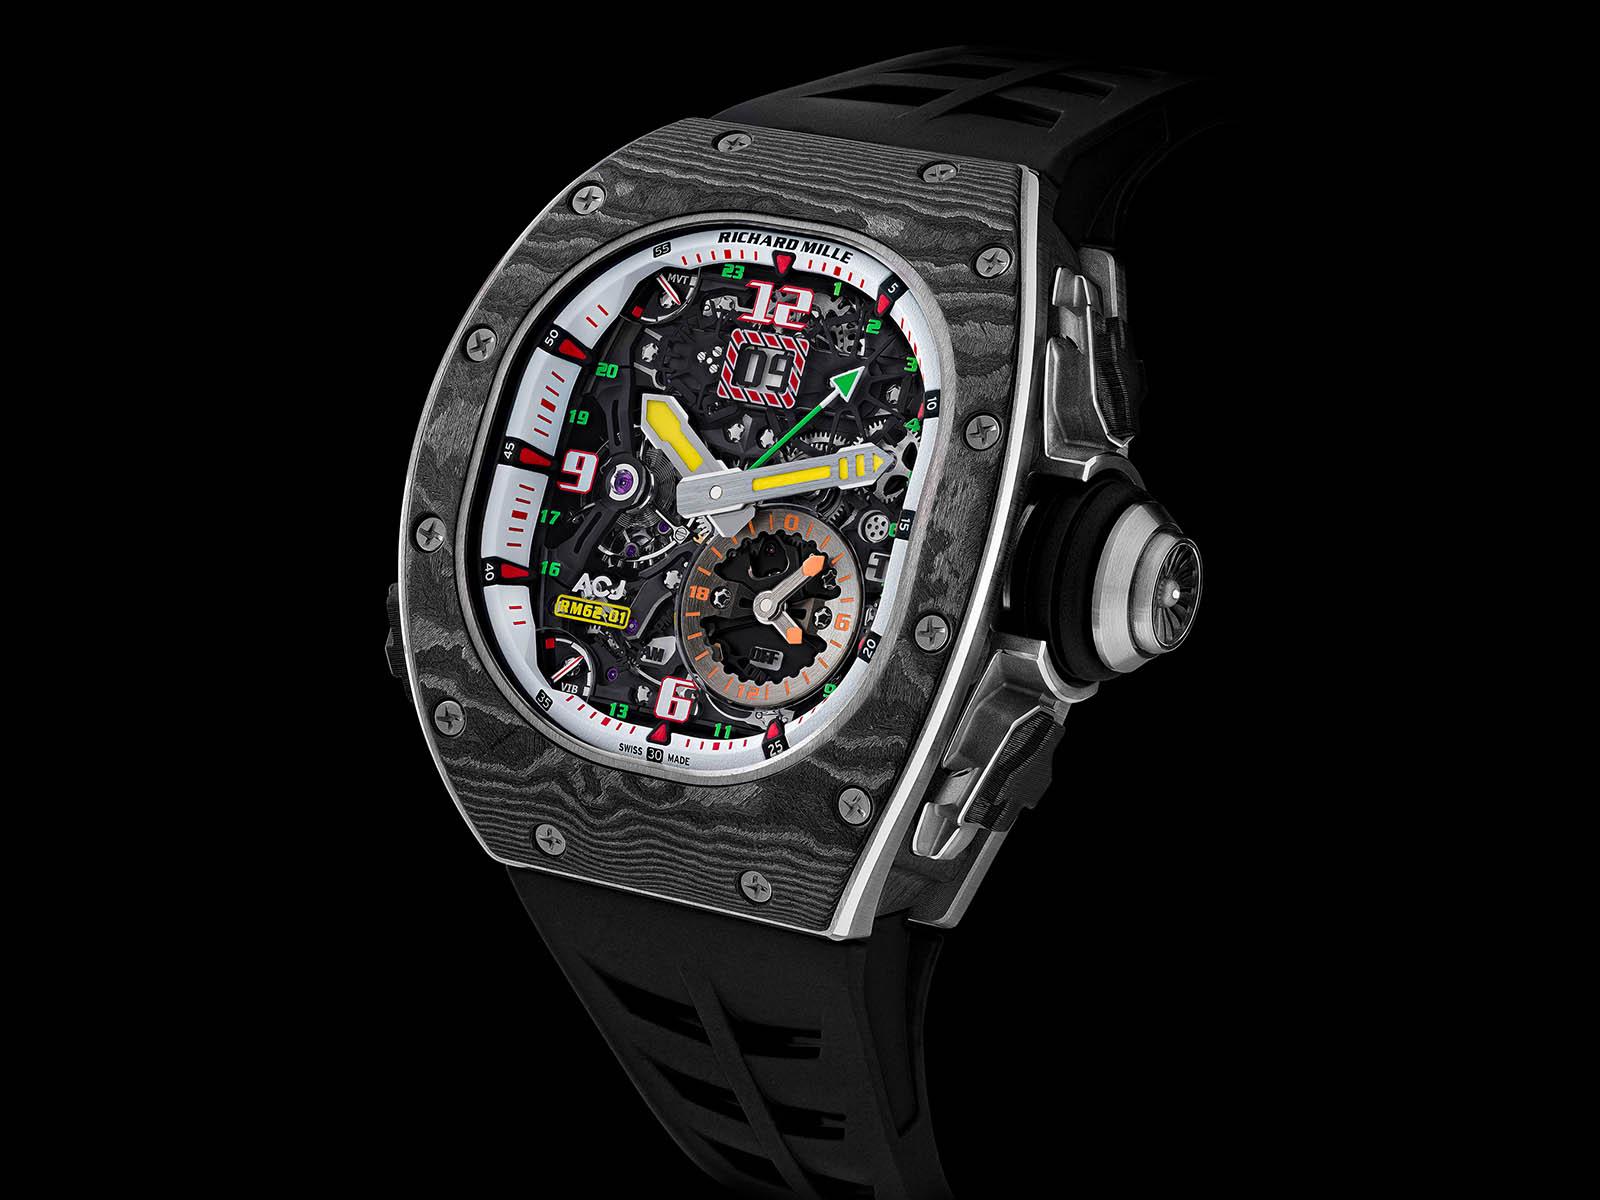 mechanical-alarm-watches-richard-mille-rm-62-01-2.jpg